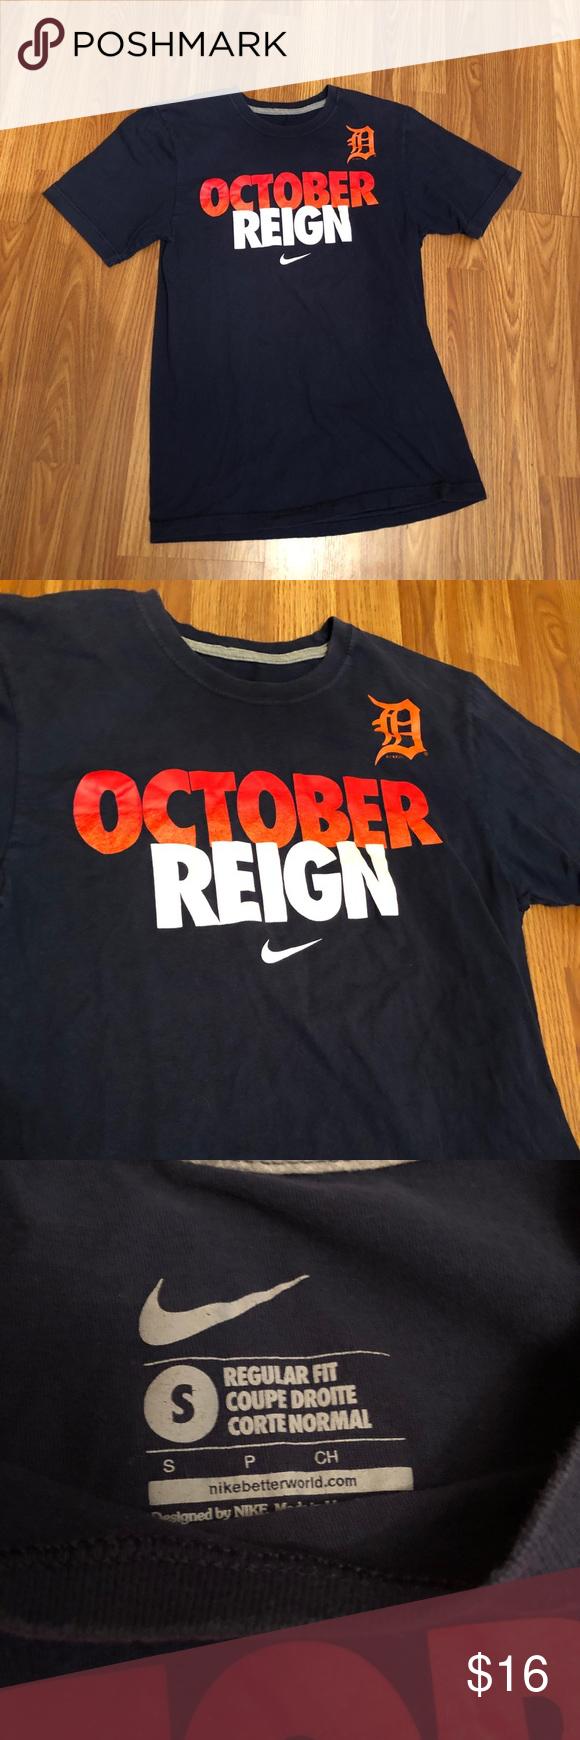 Nike Detroit Tigers Shirt Detroit Tigers Shirts Shirts Nike Shirts [ 1740 x 580 Pixel ]